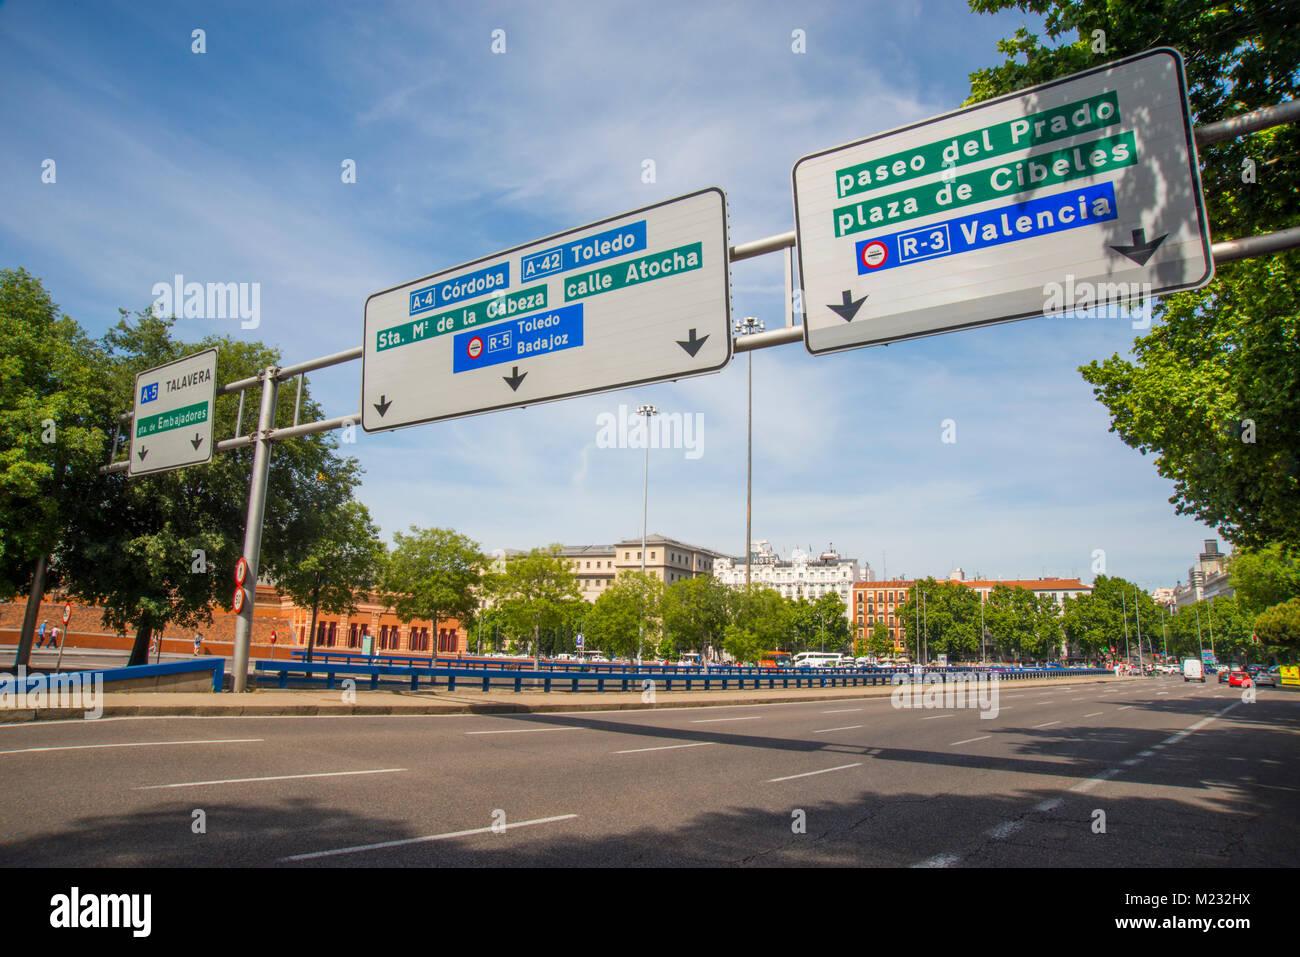 Atocha street. Madrid, Spain. Stock Photo